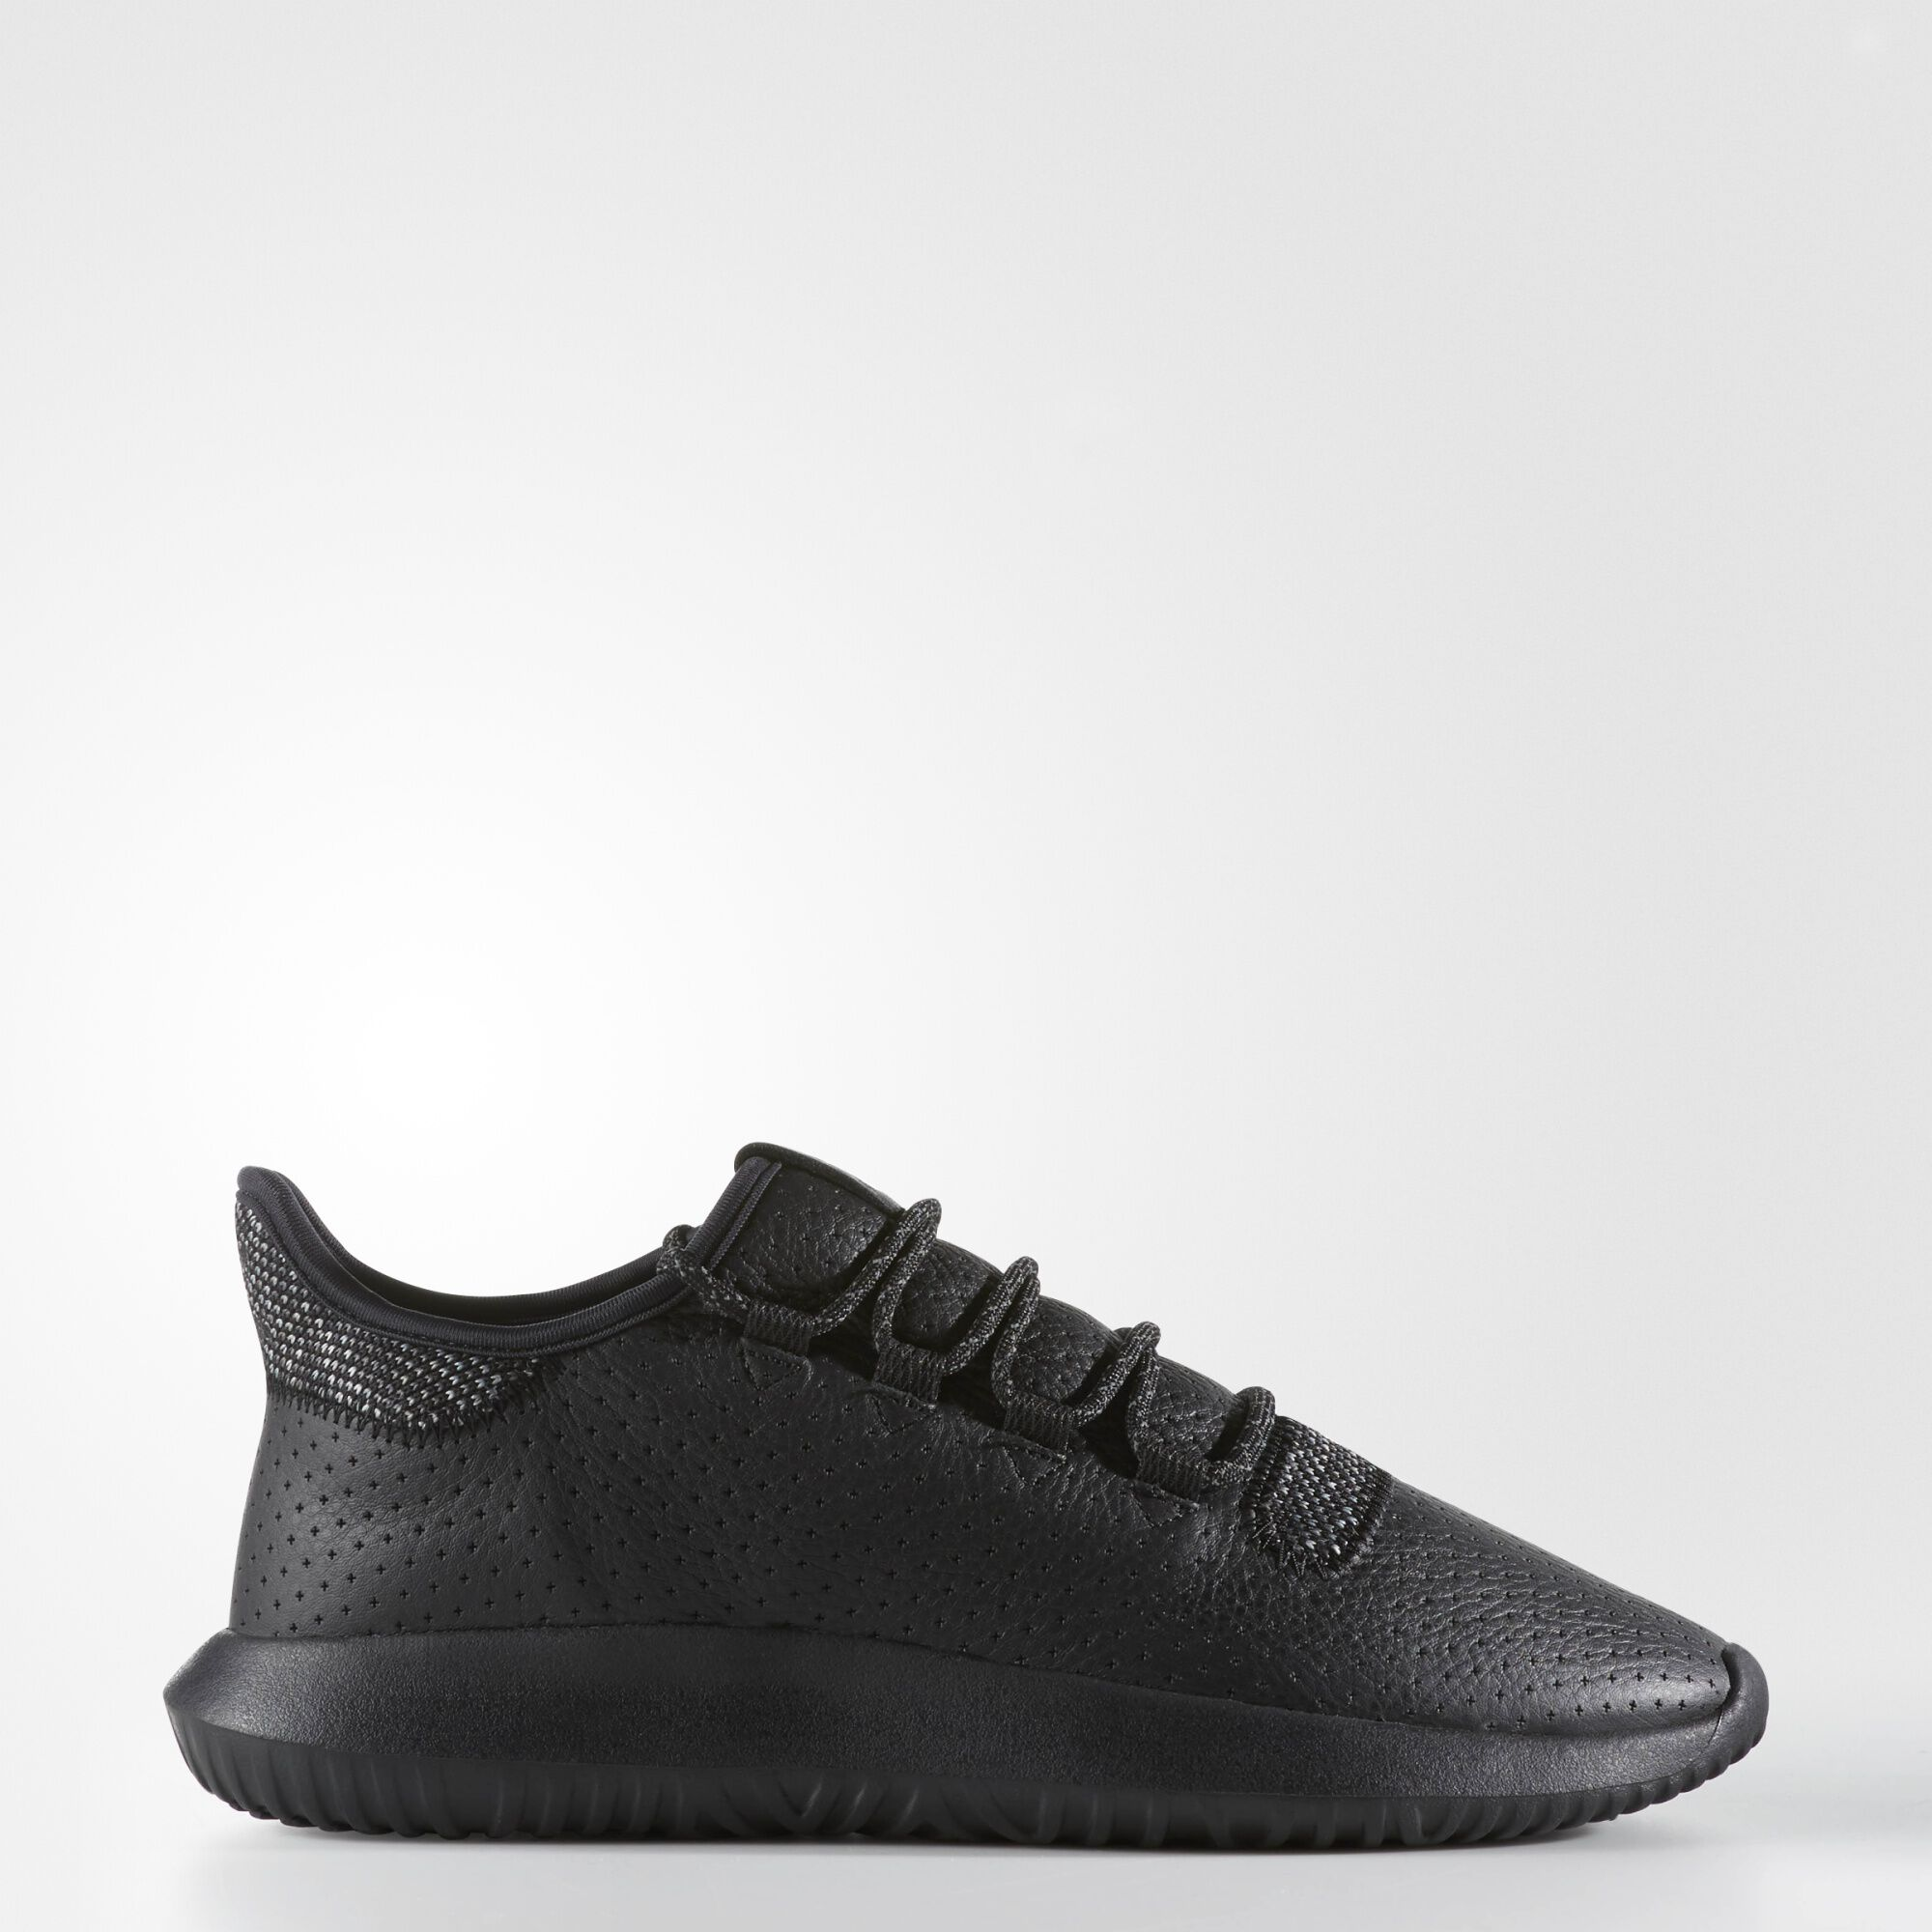 Adidas Tubular Shadow Black Grey